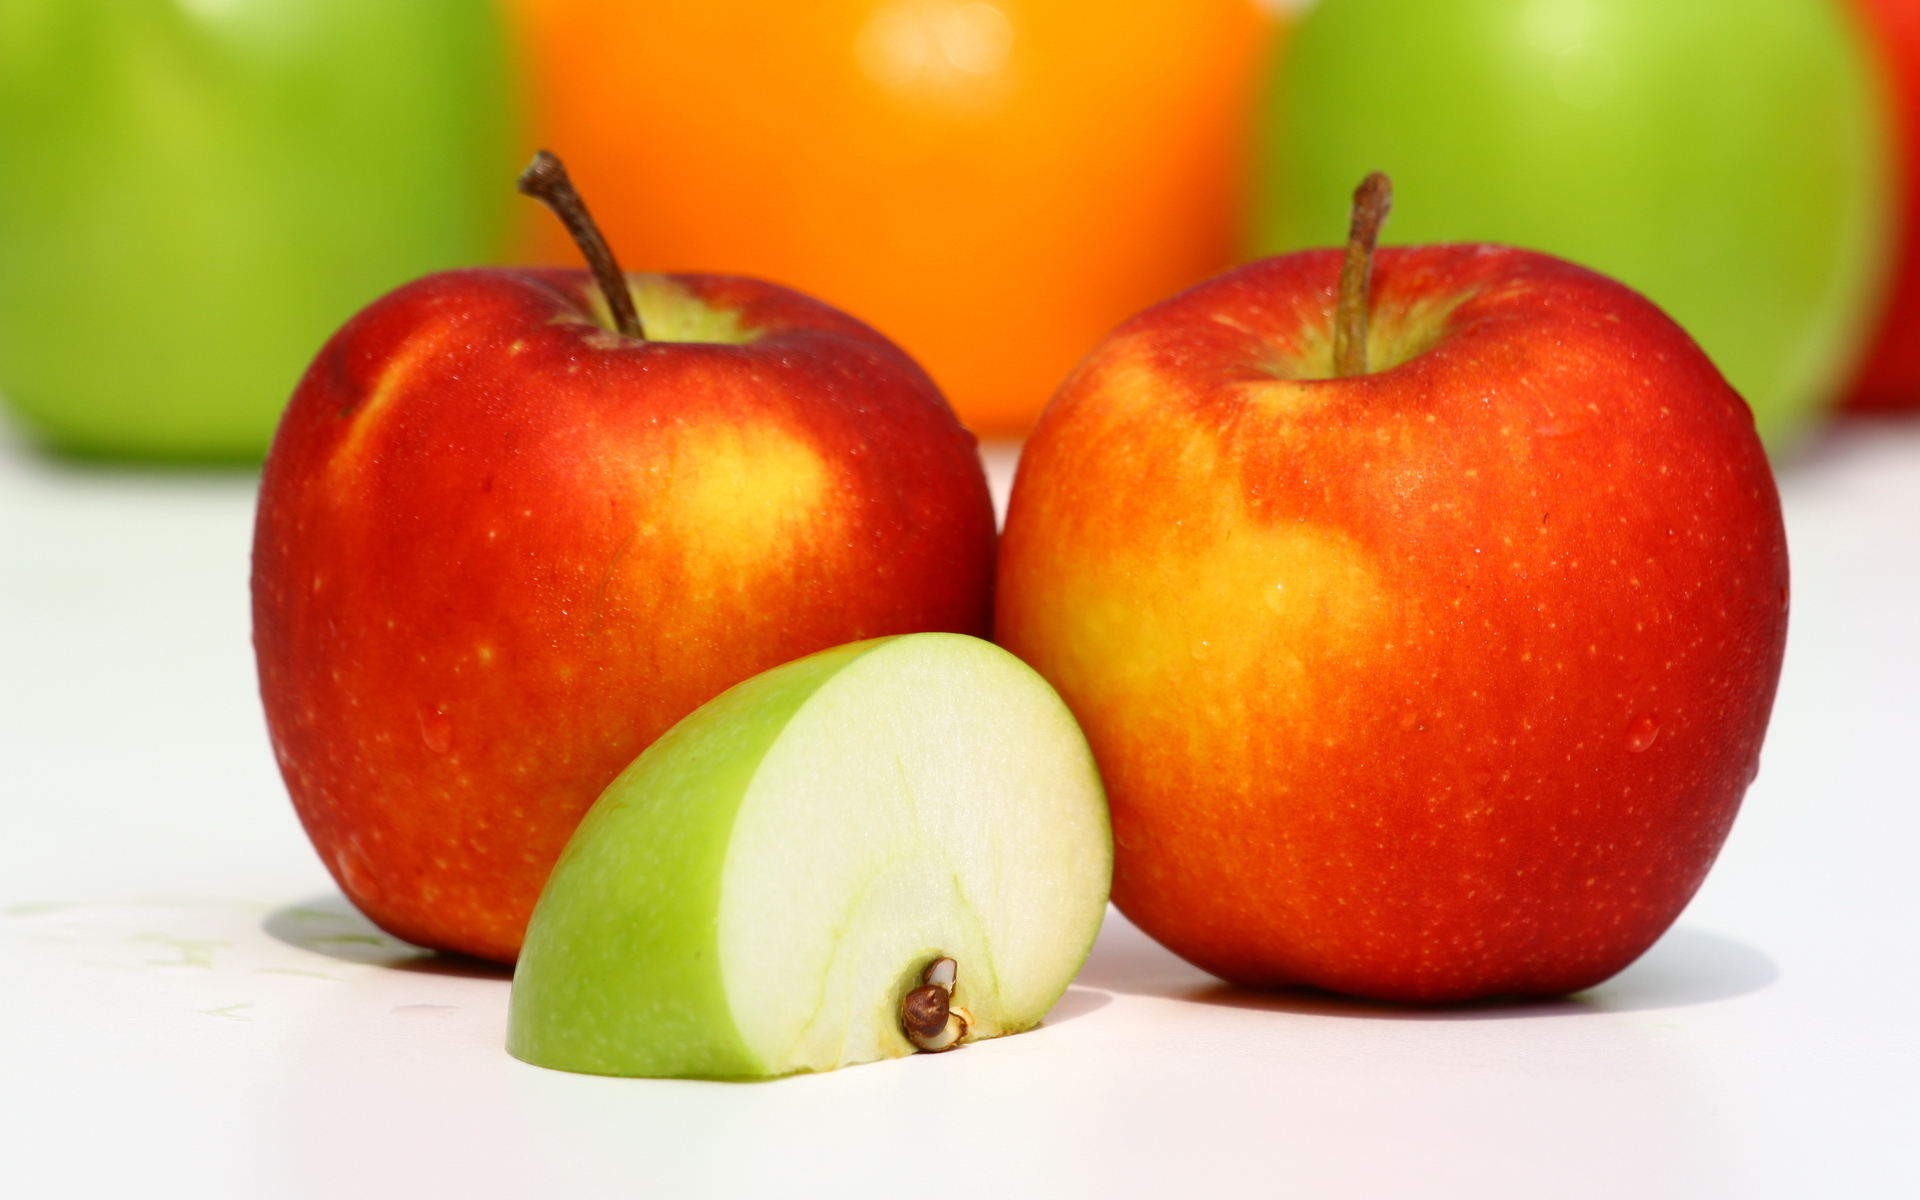 еда яблоки food apples без смс